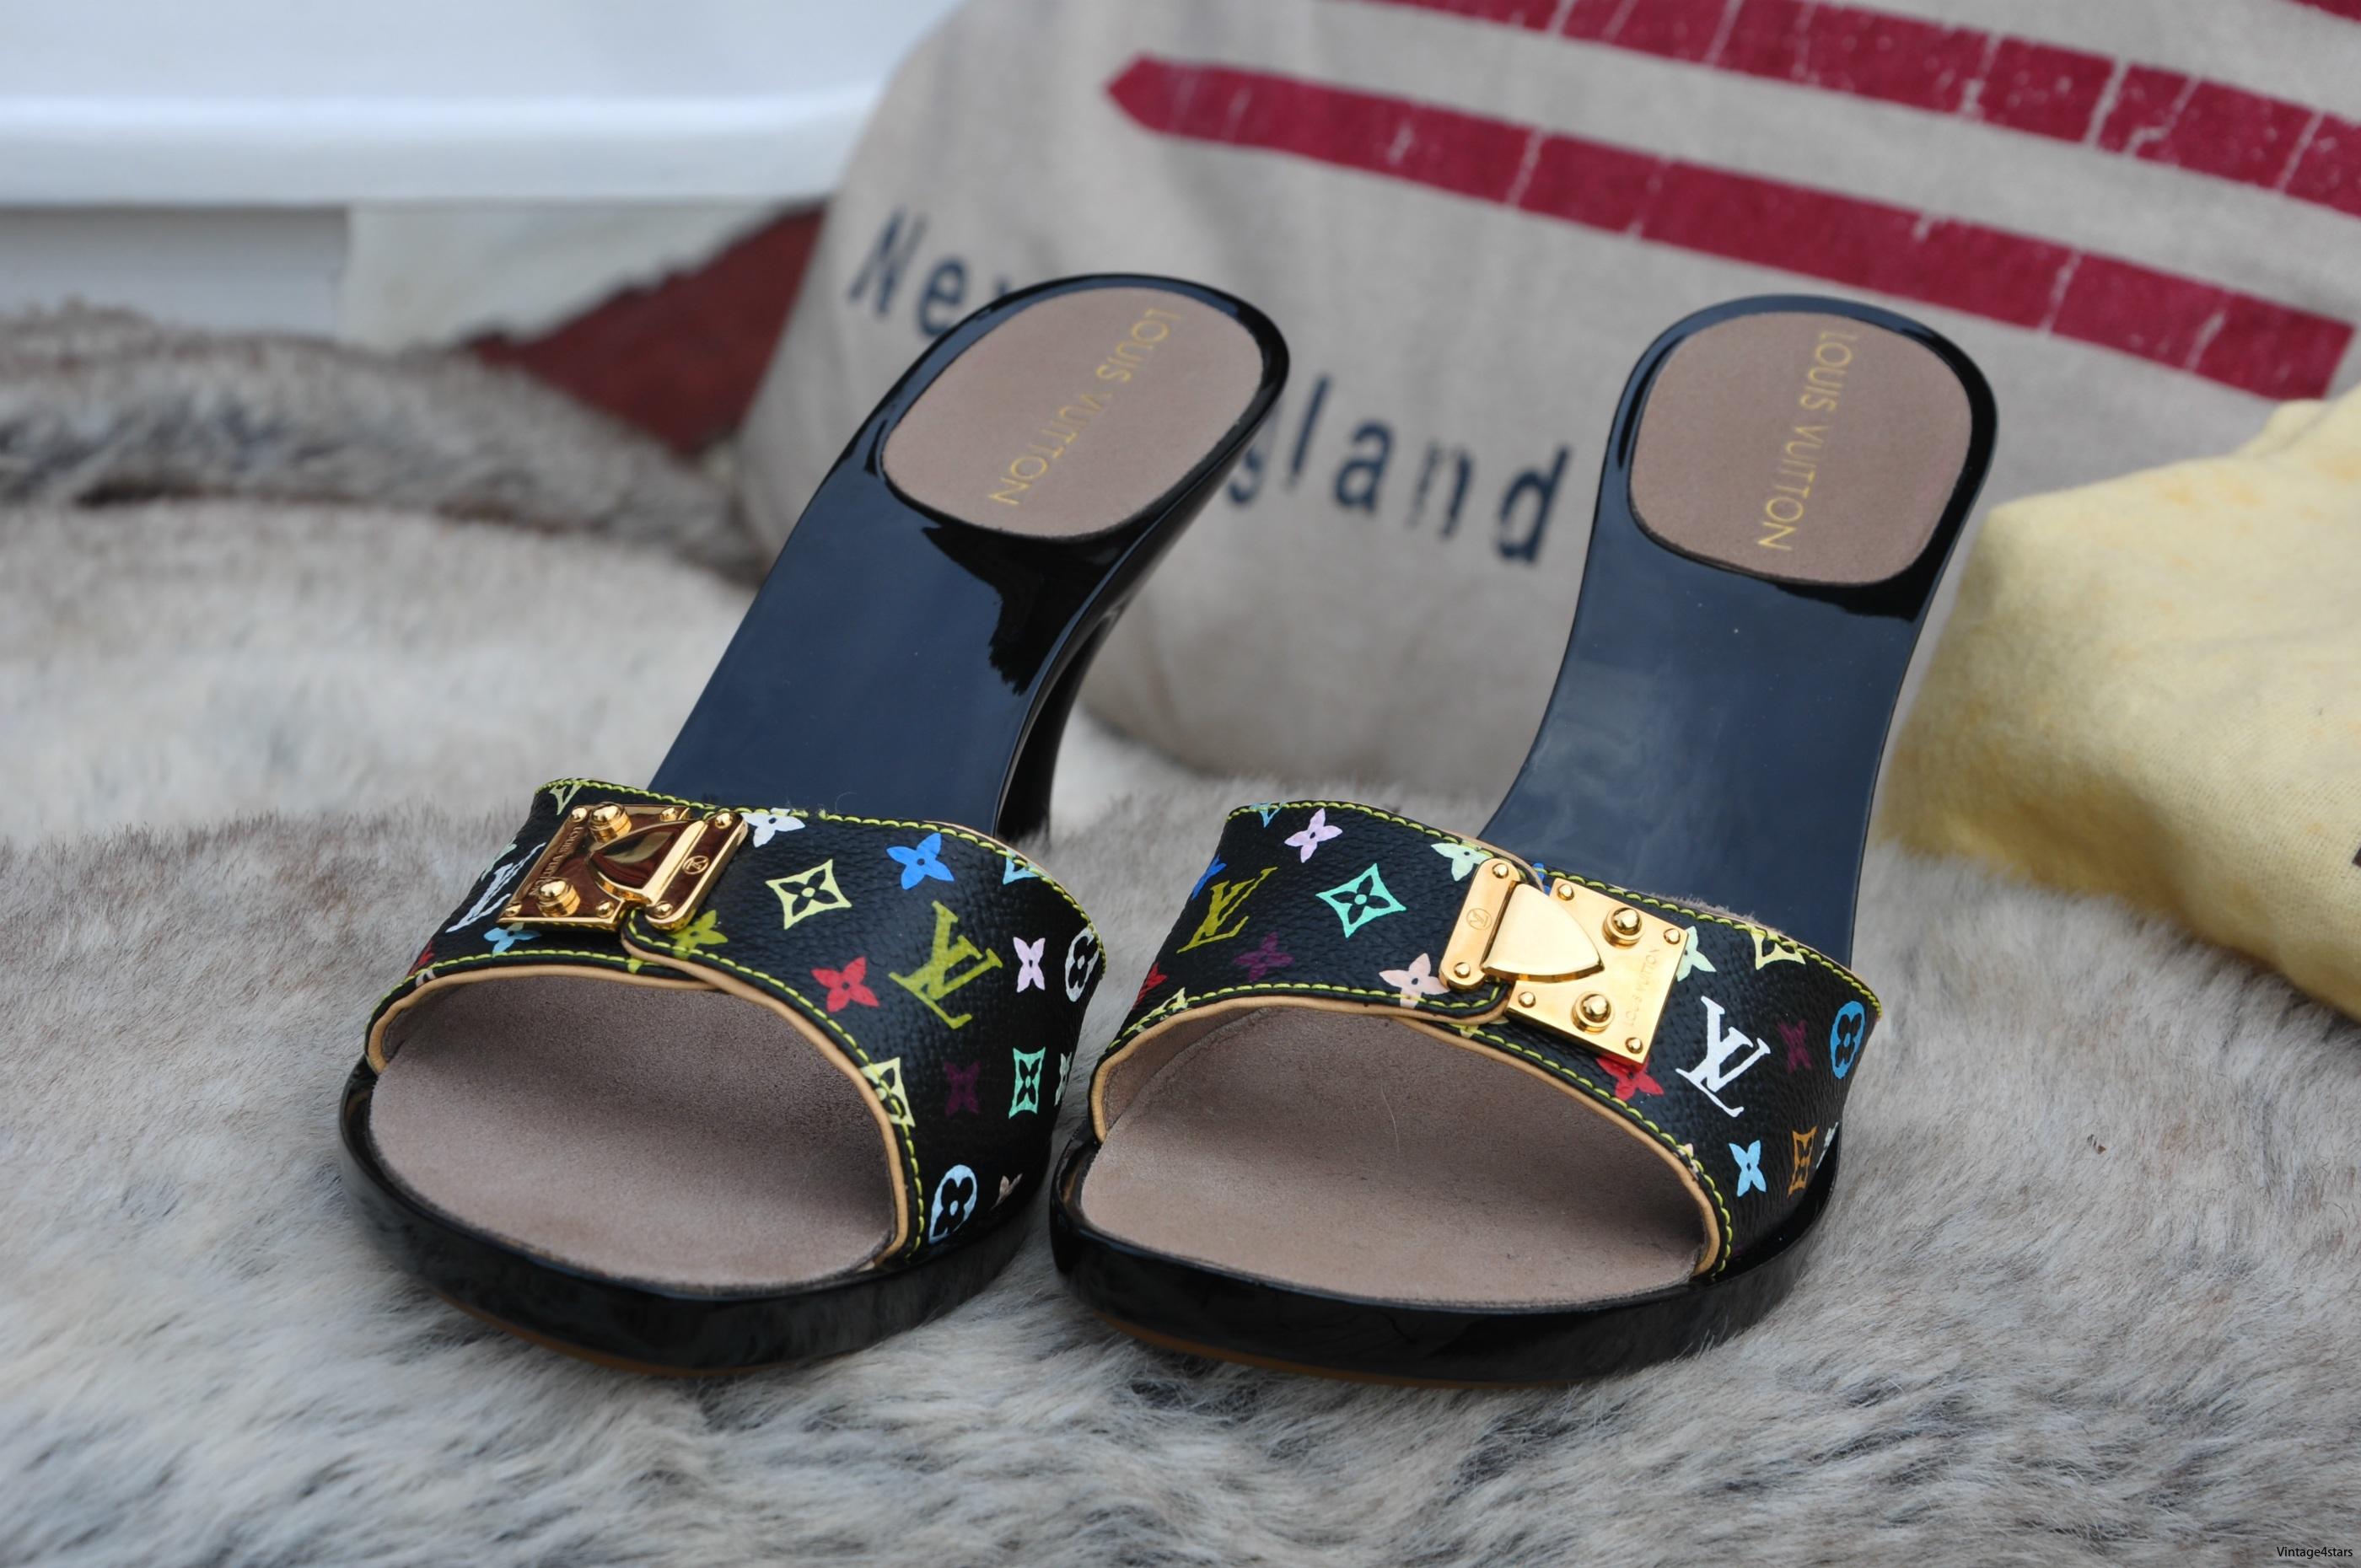 Louis Vuitton Sandals Murakami